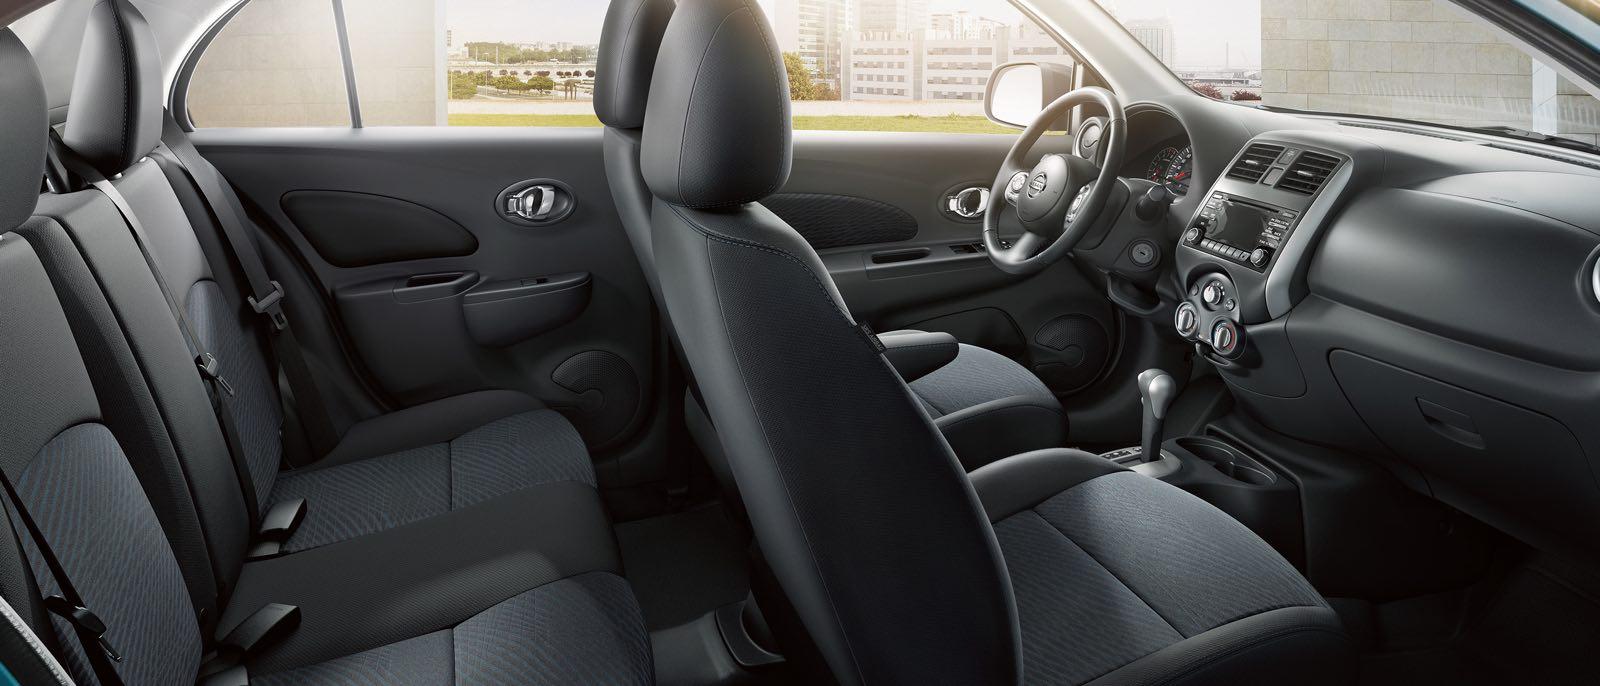 2015 Nissan Micra Slider